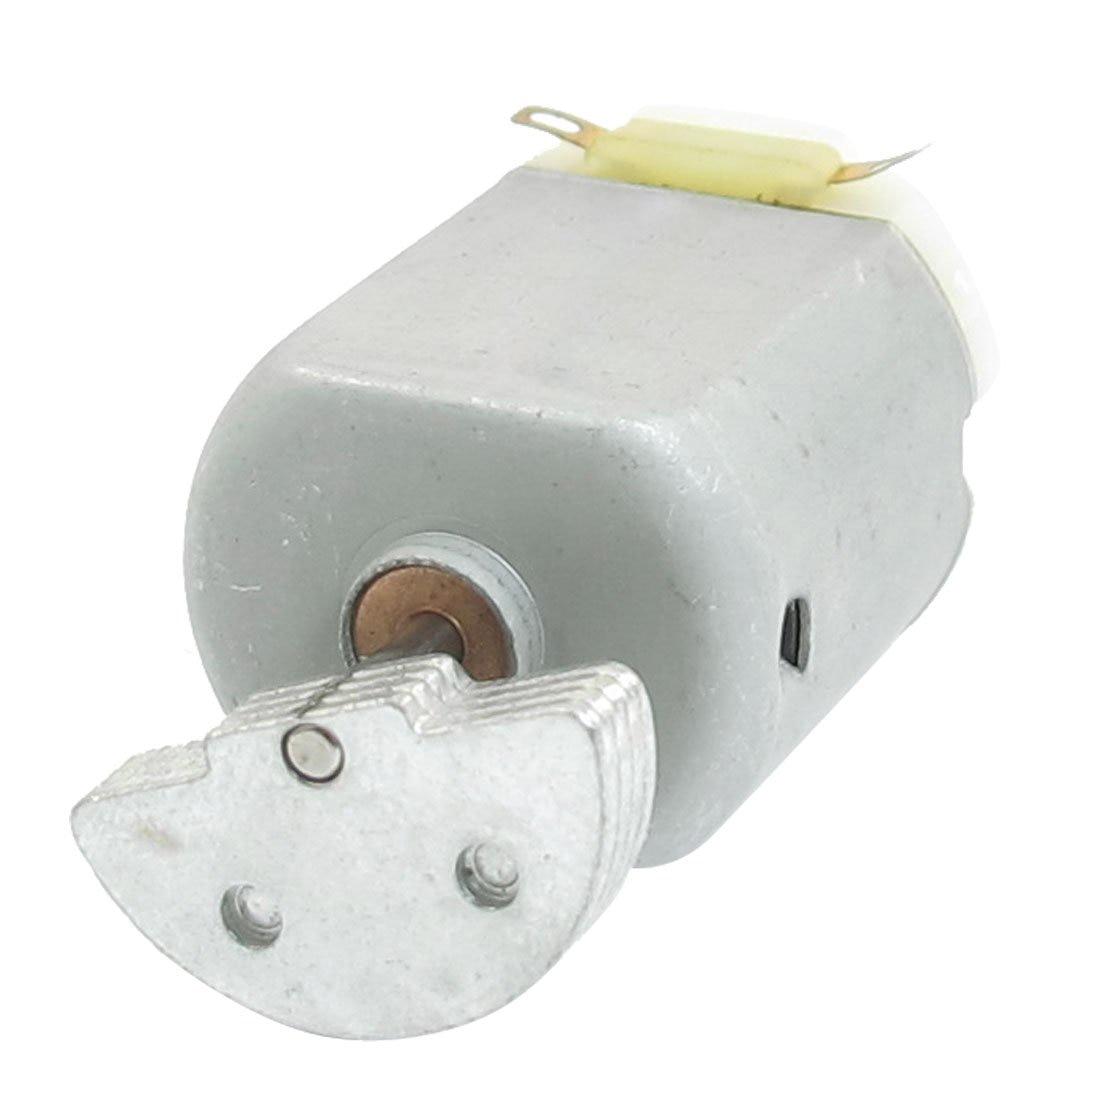 DHDL-DC 5V 3200RPM электрический мини вибрирующий вибромотор